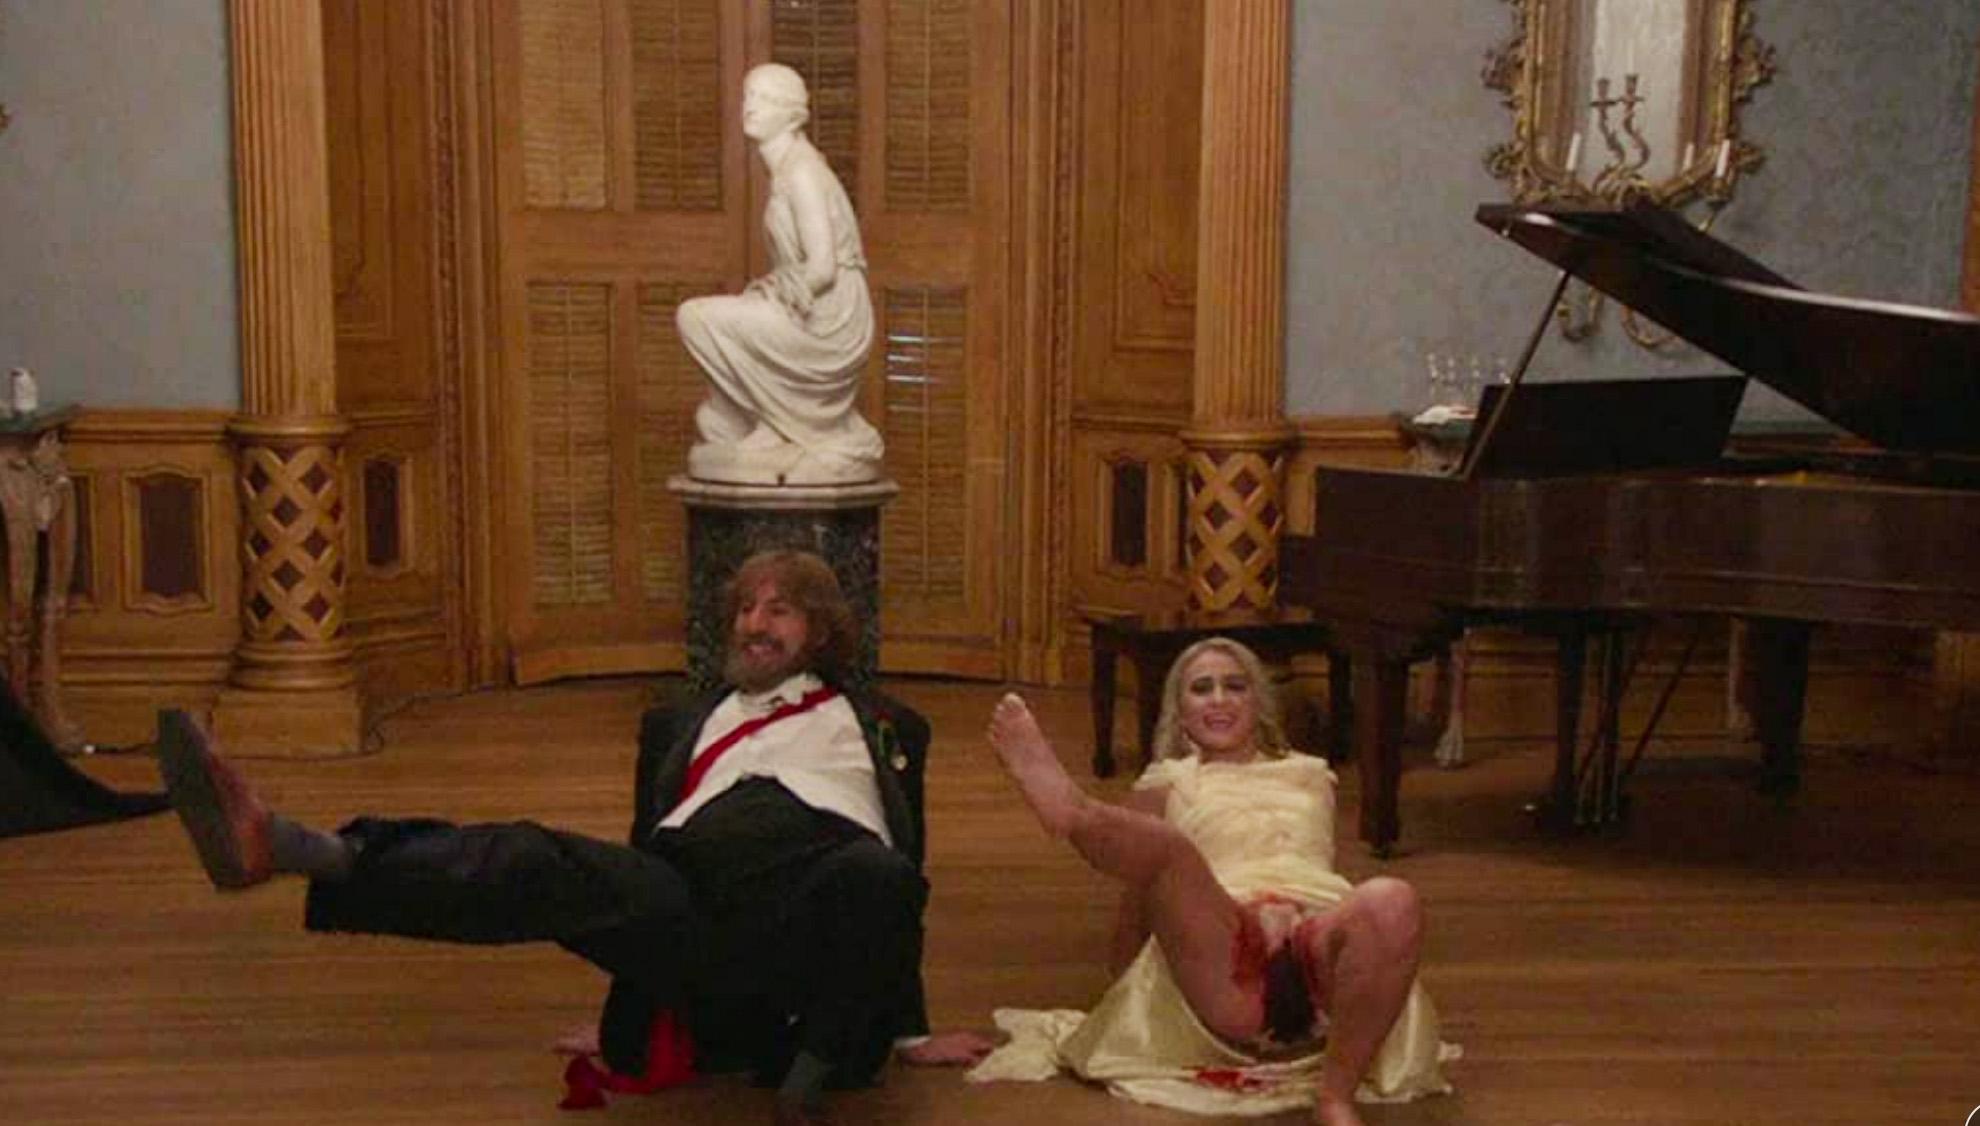 Ikke alles humor: Sacha Baron Cohen og Maria Bakalova i Borat Subsequent Moviefilm (Prime Video)